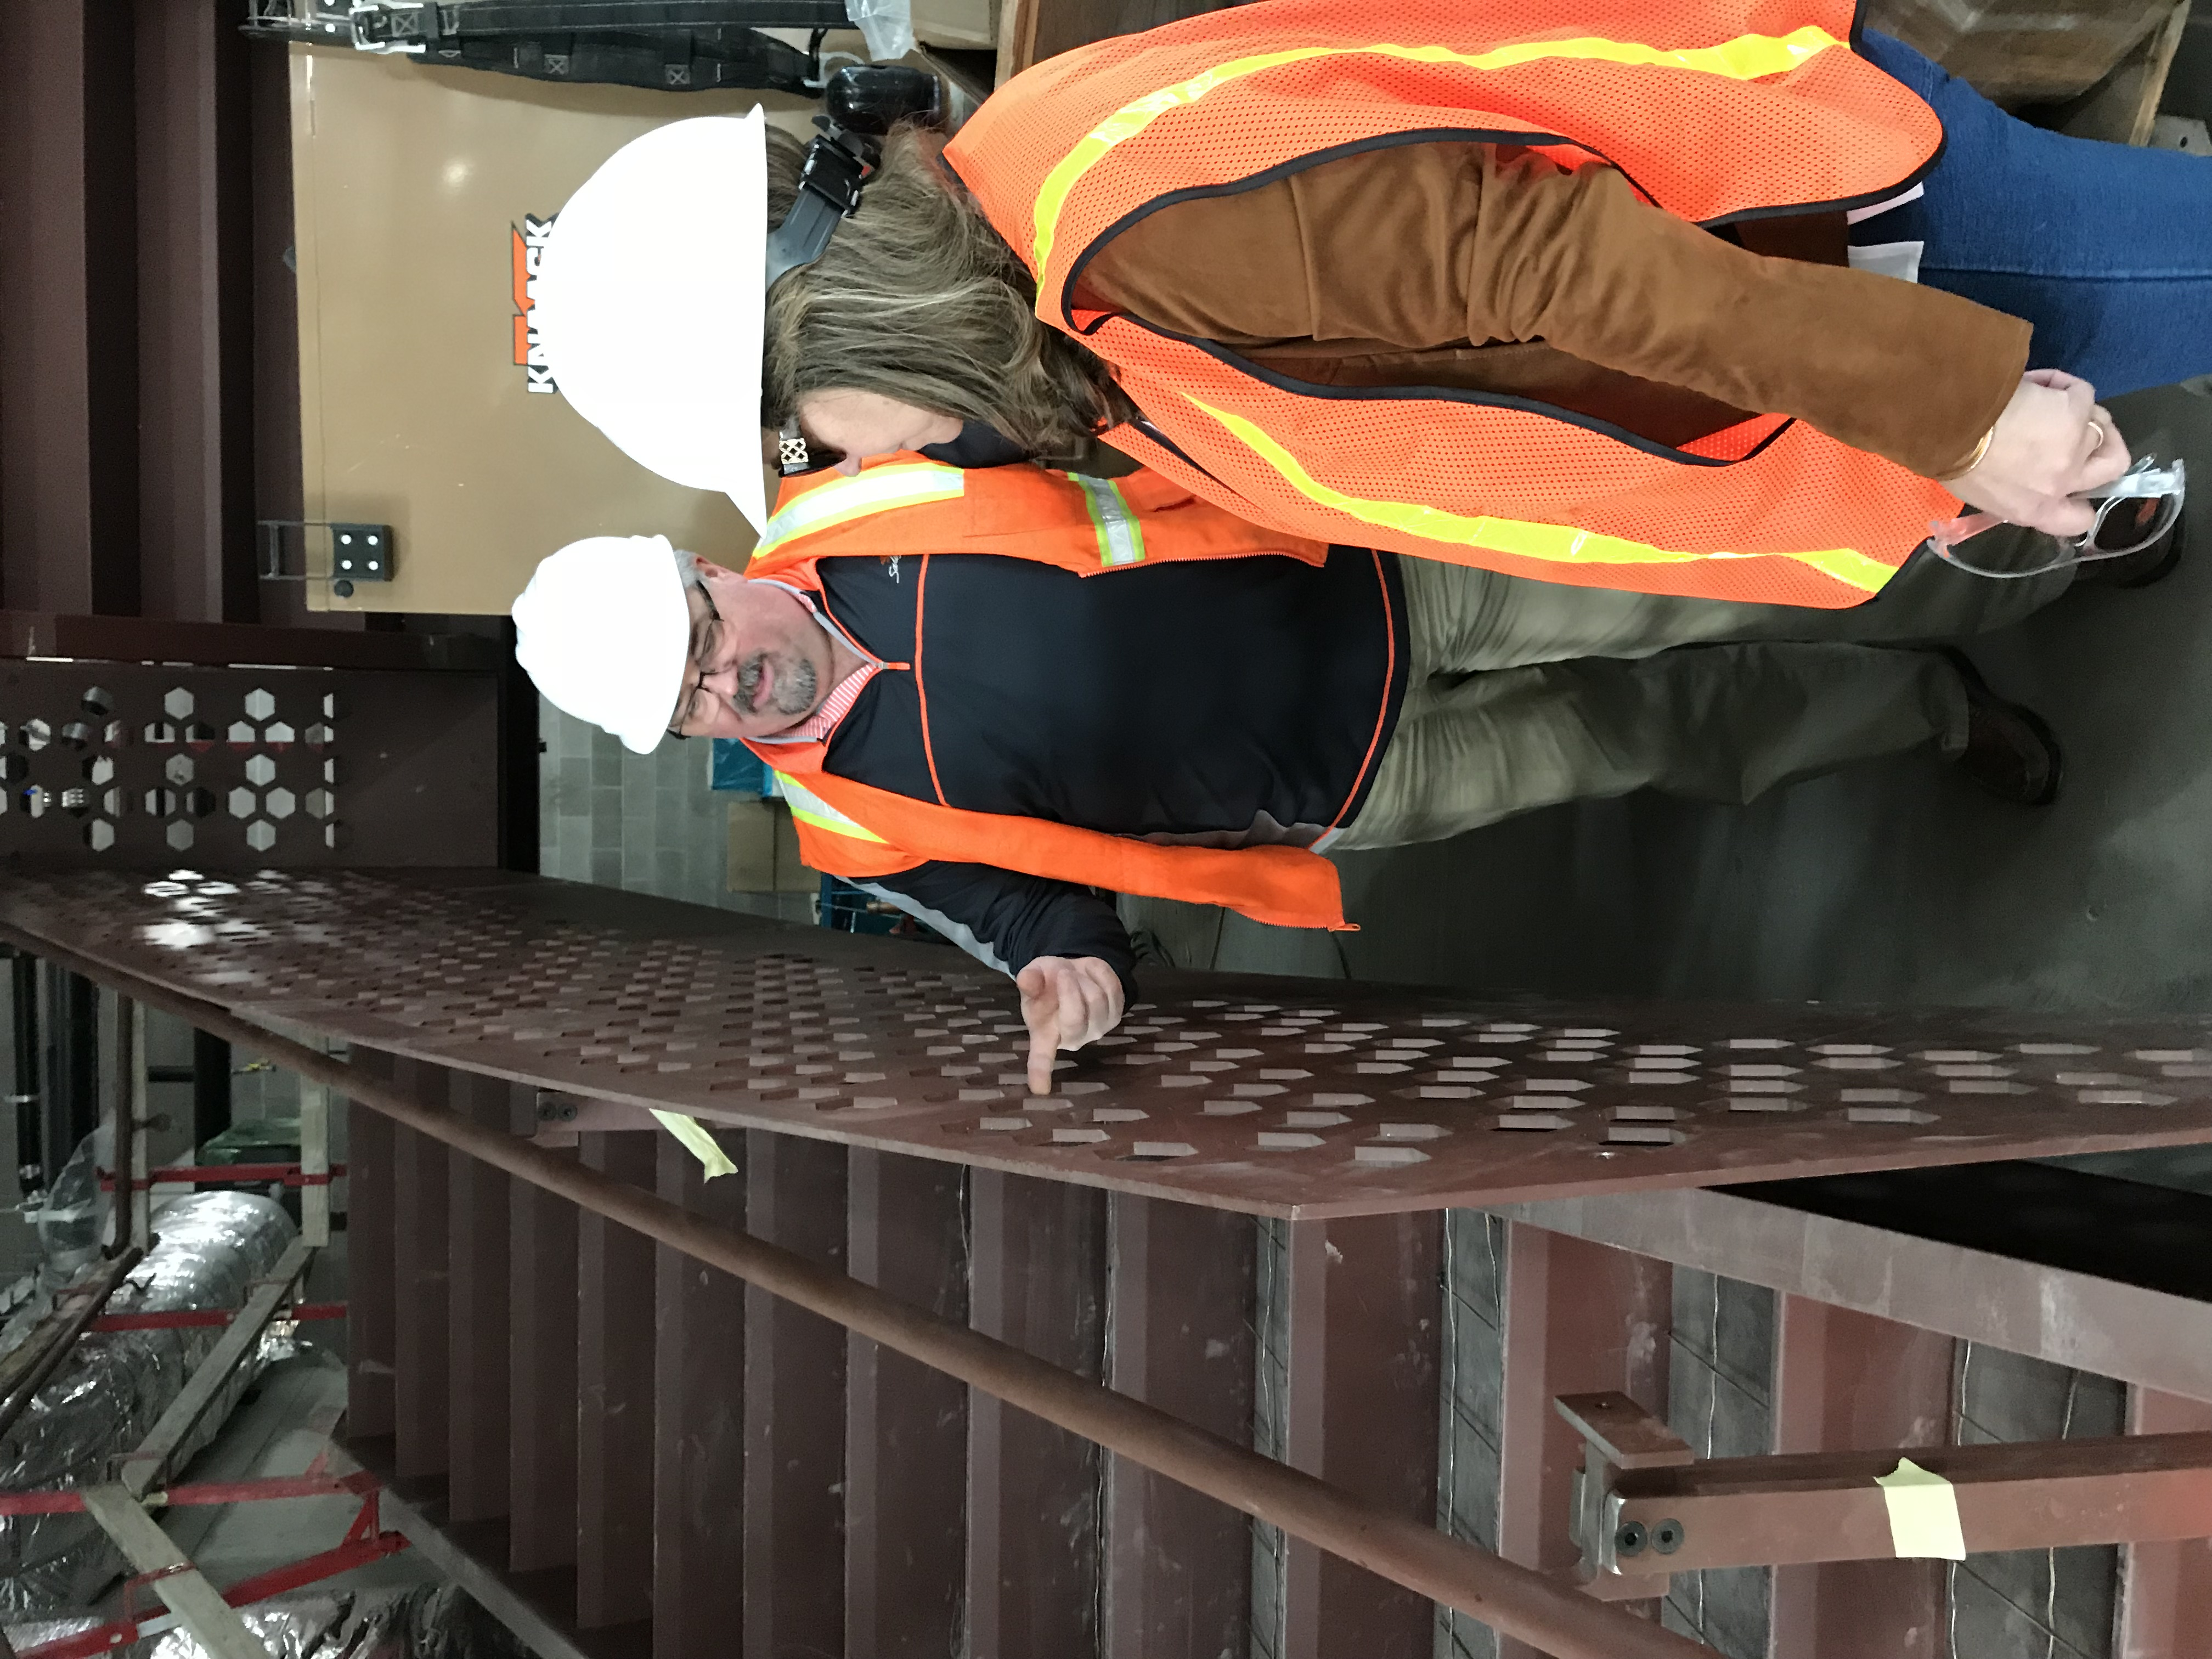 Terri & Dave - Hyatt stairway.jpg